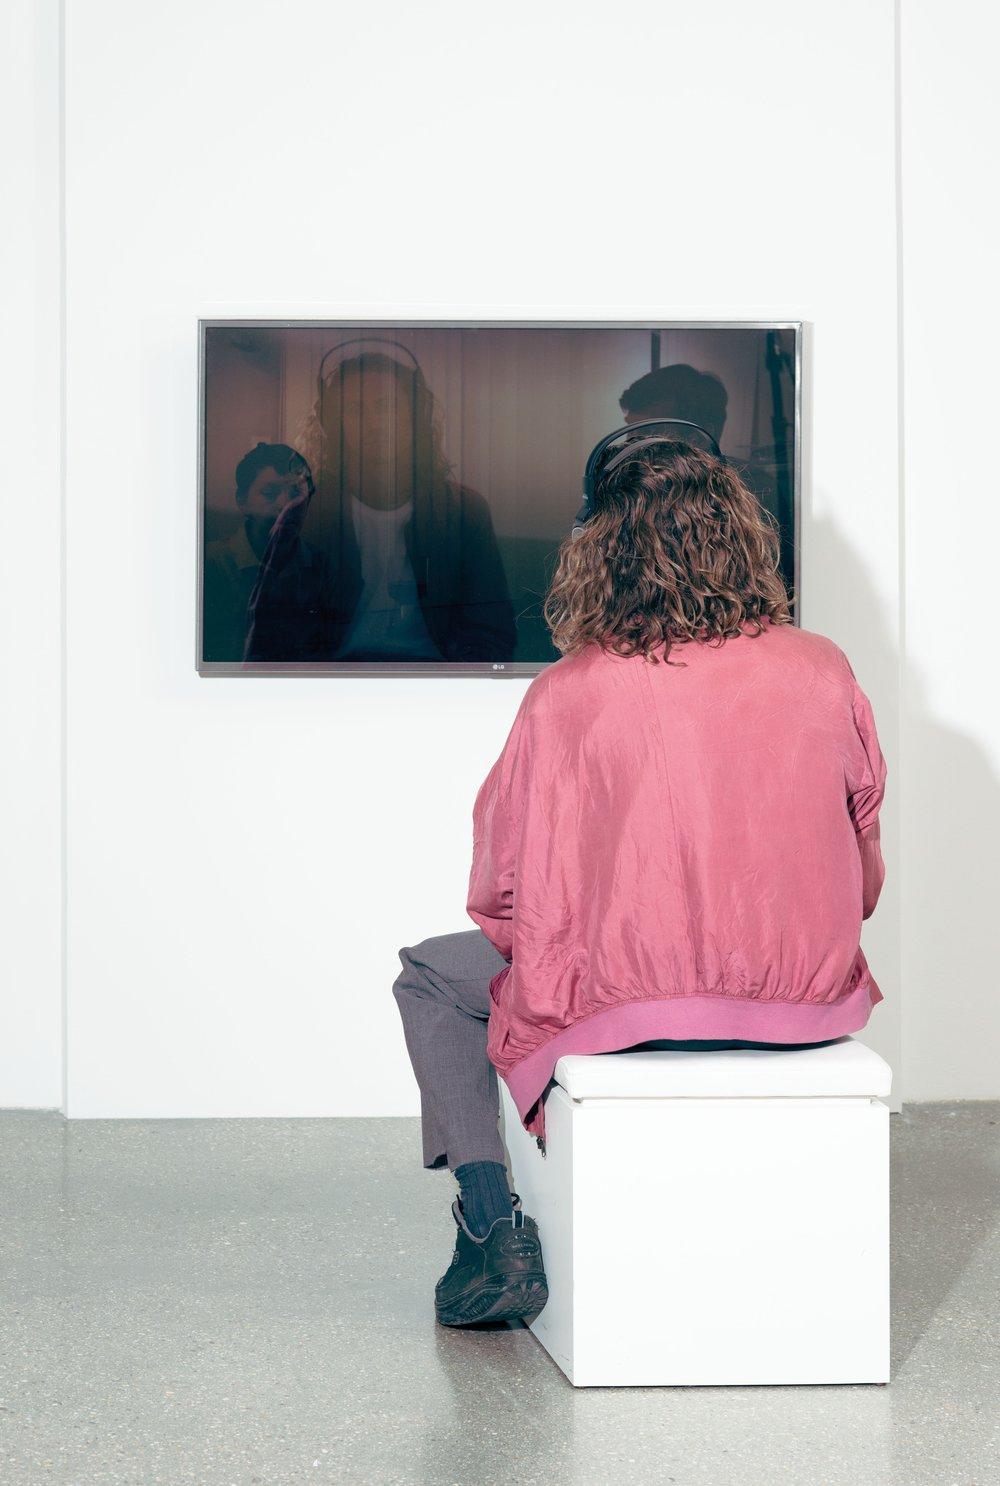 Keren Cytter, Ocean,2014 Foto: Thomas Albdorf, © Belvedere, Wien Courtesy Pilar Corrias Gallery, London